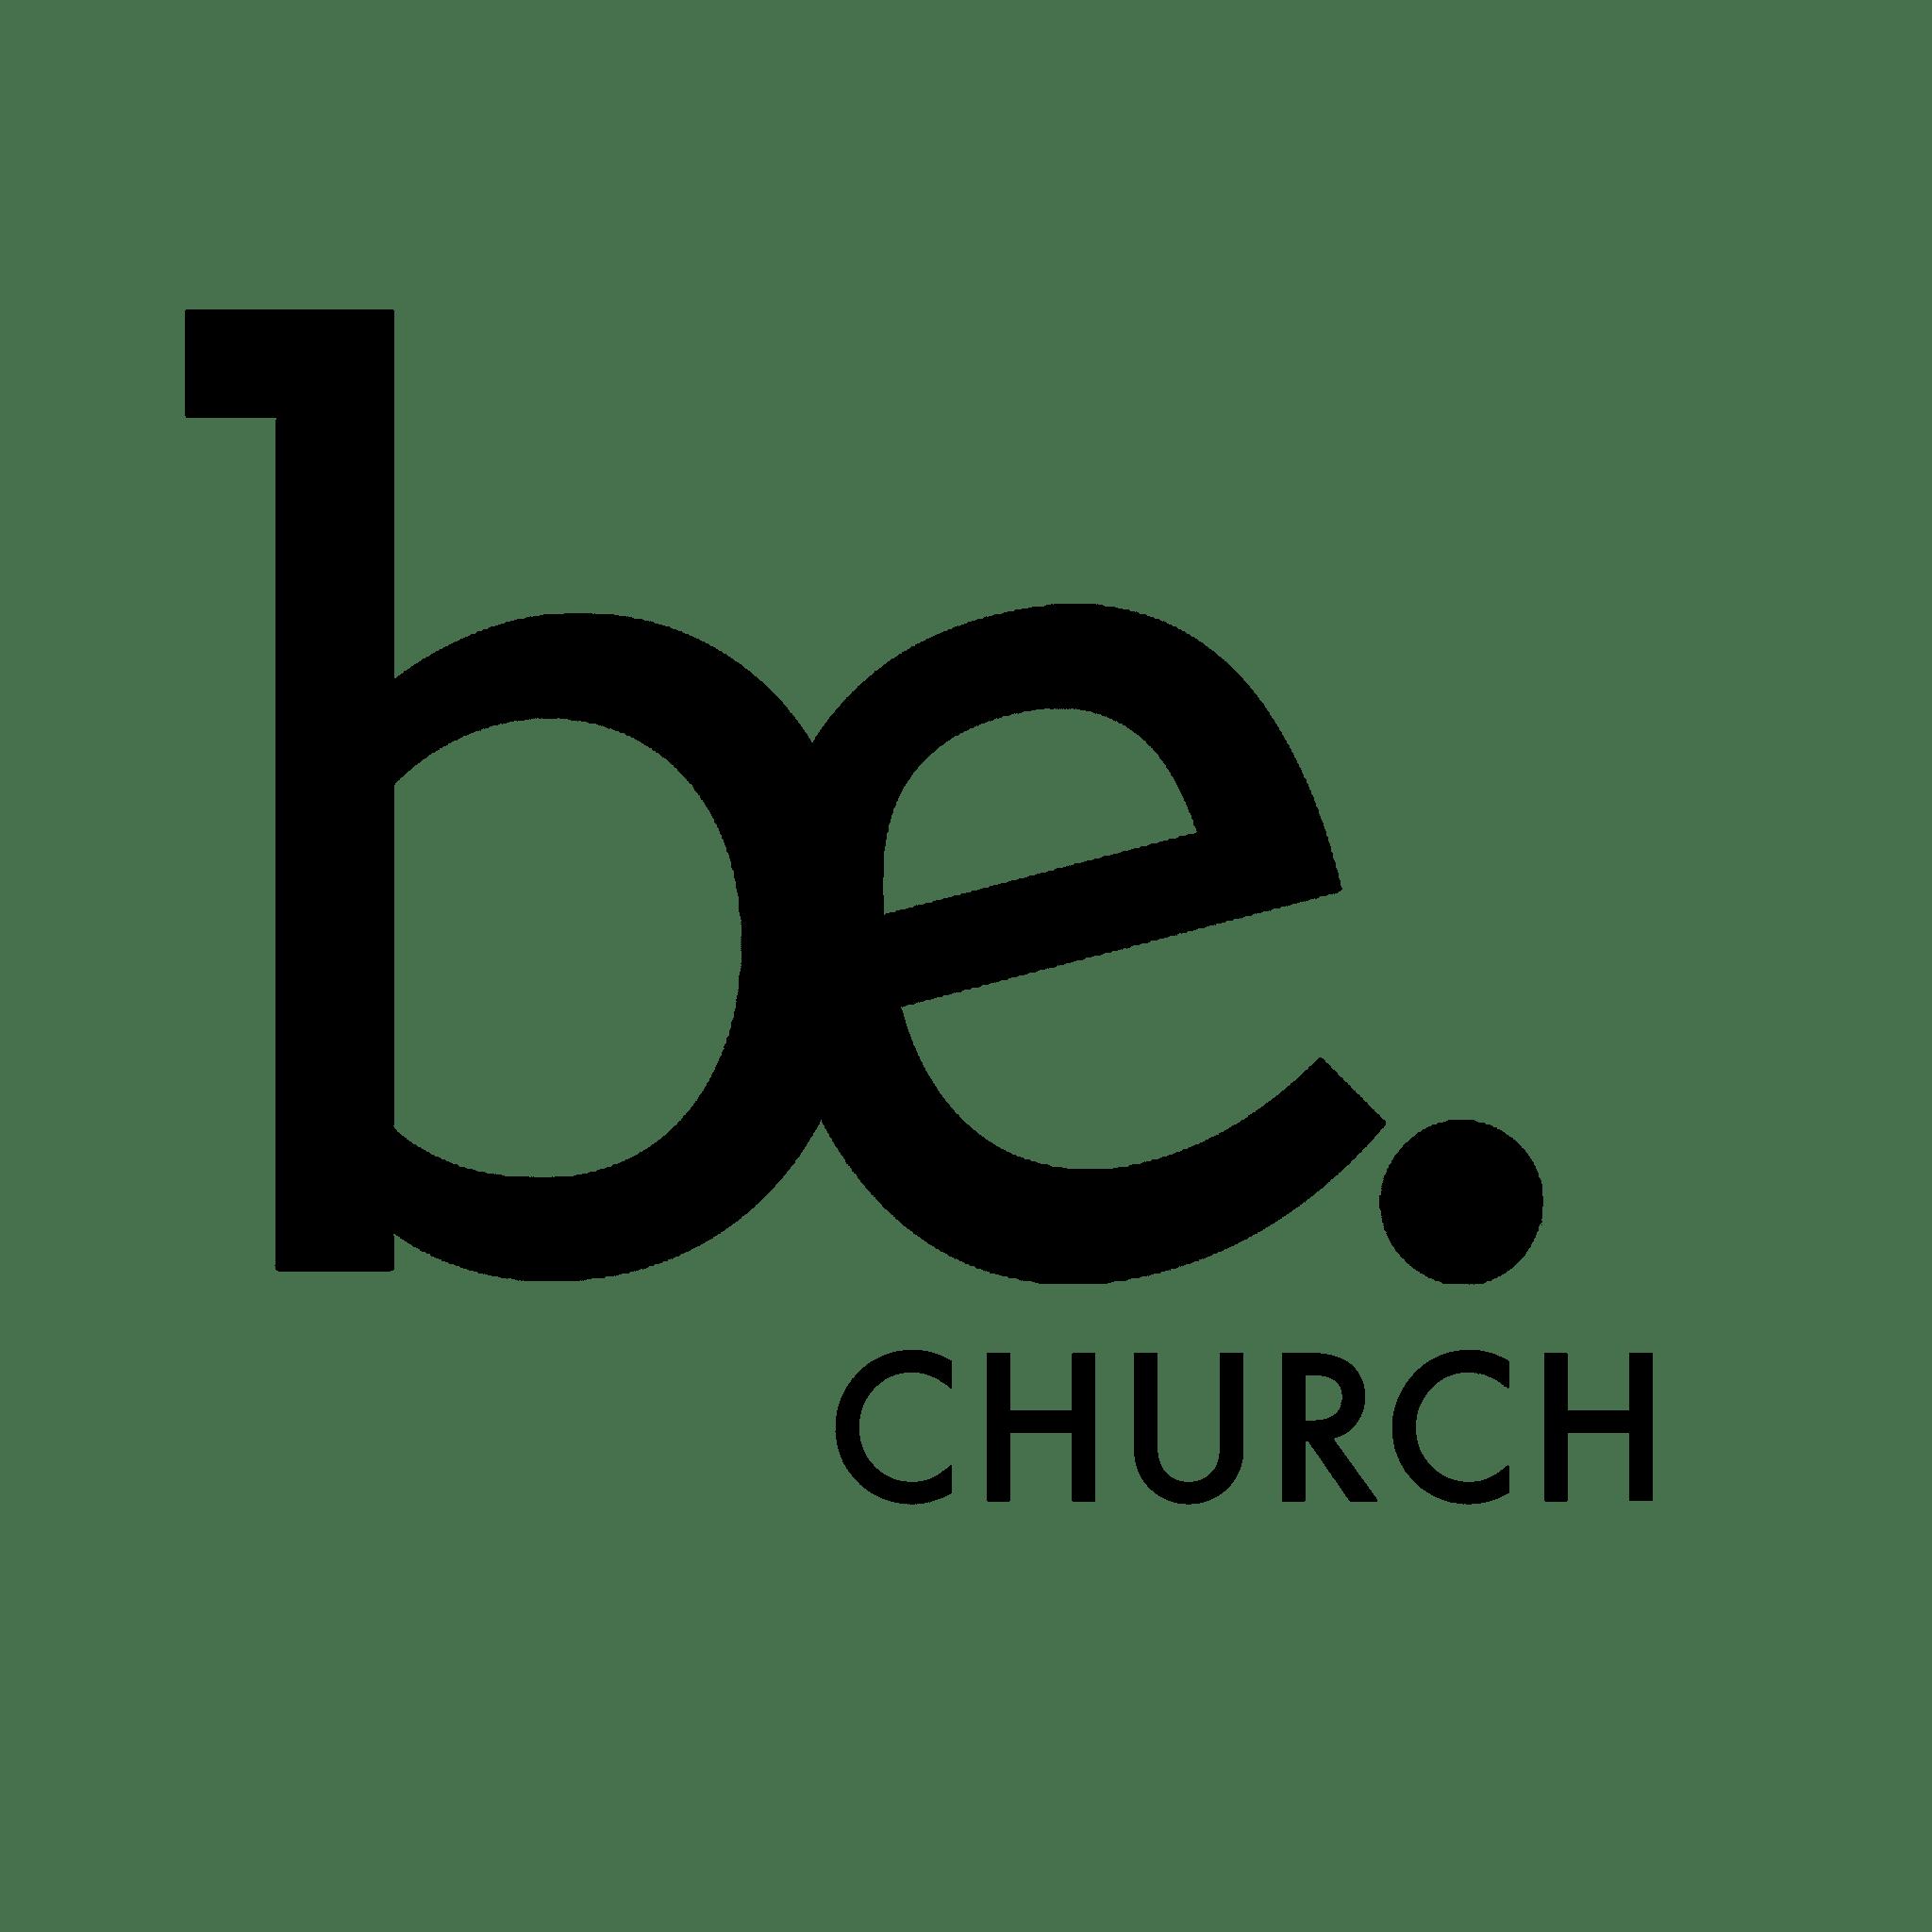 Be Church